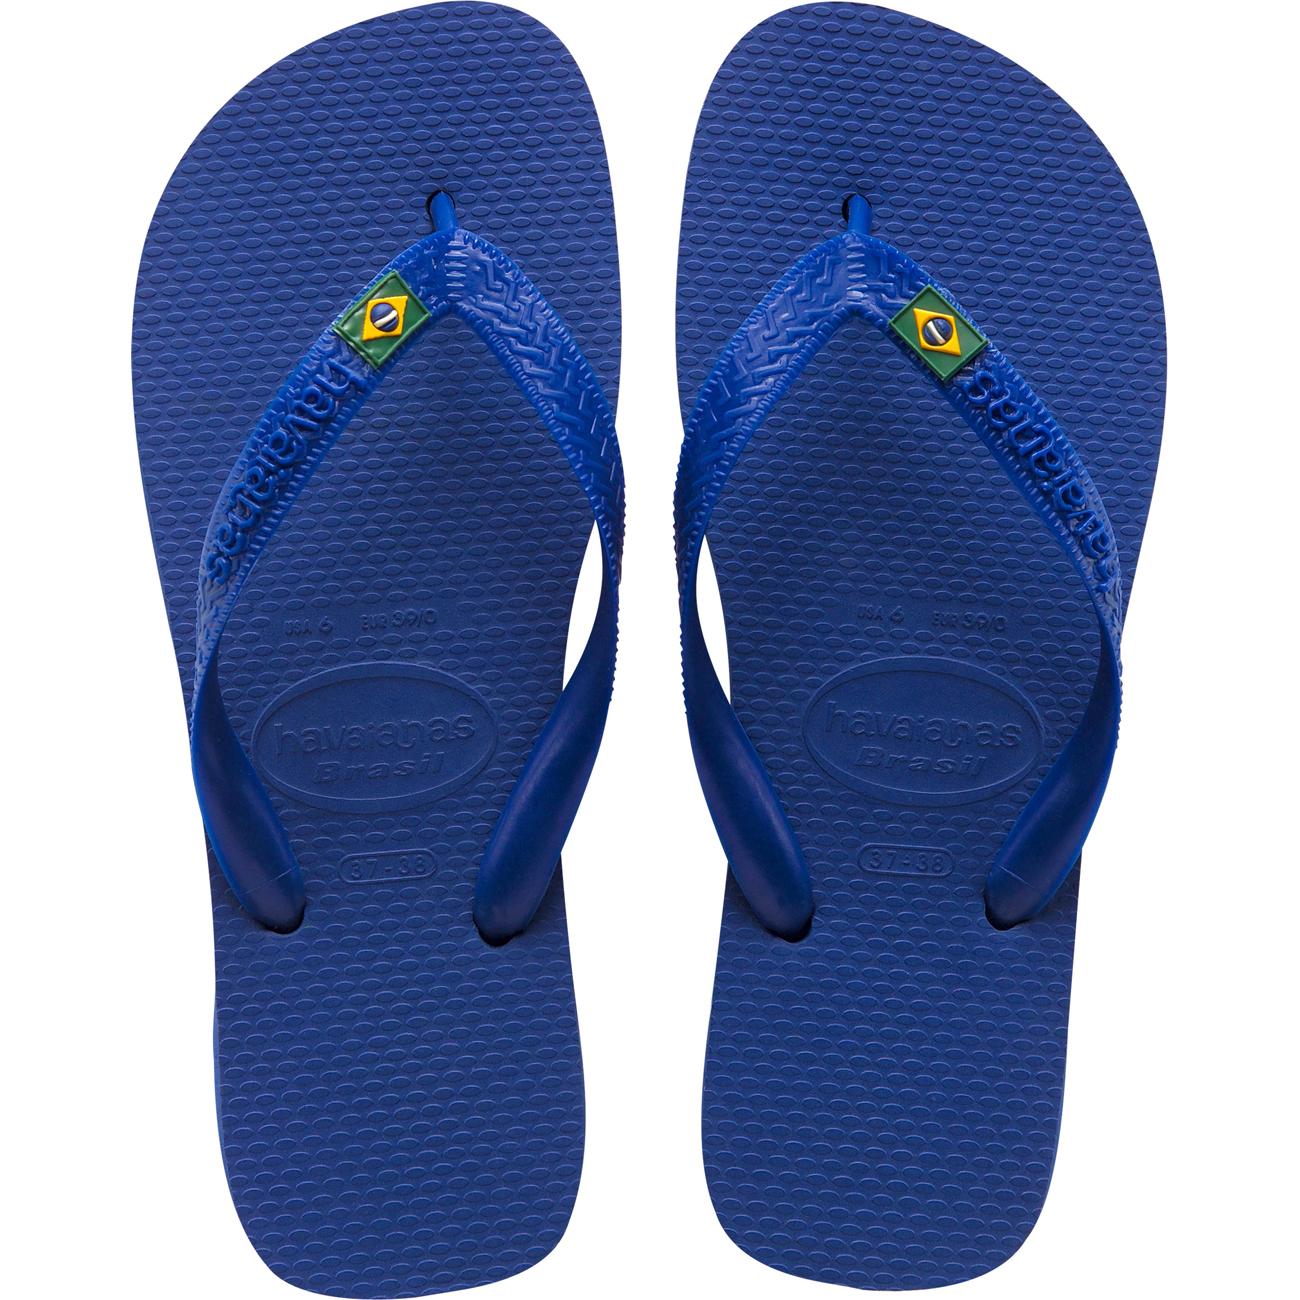 Sandalia Havaianas Brasil Azul Naval 35/6